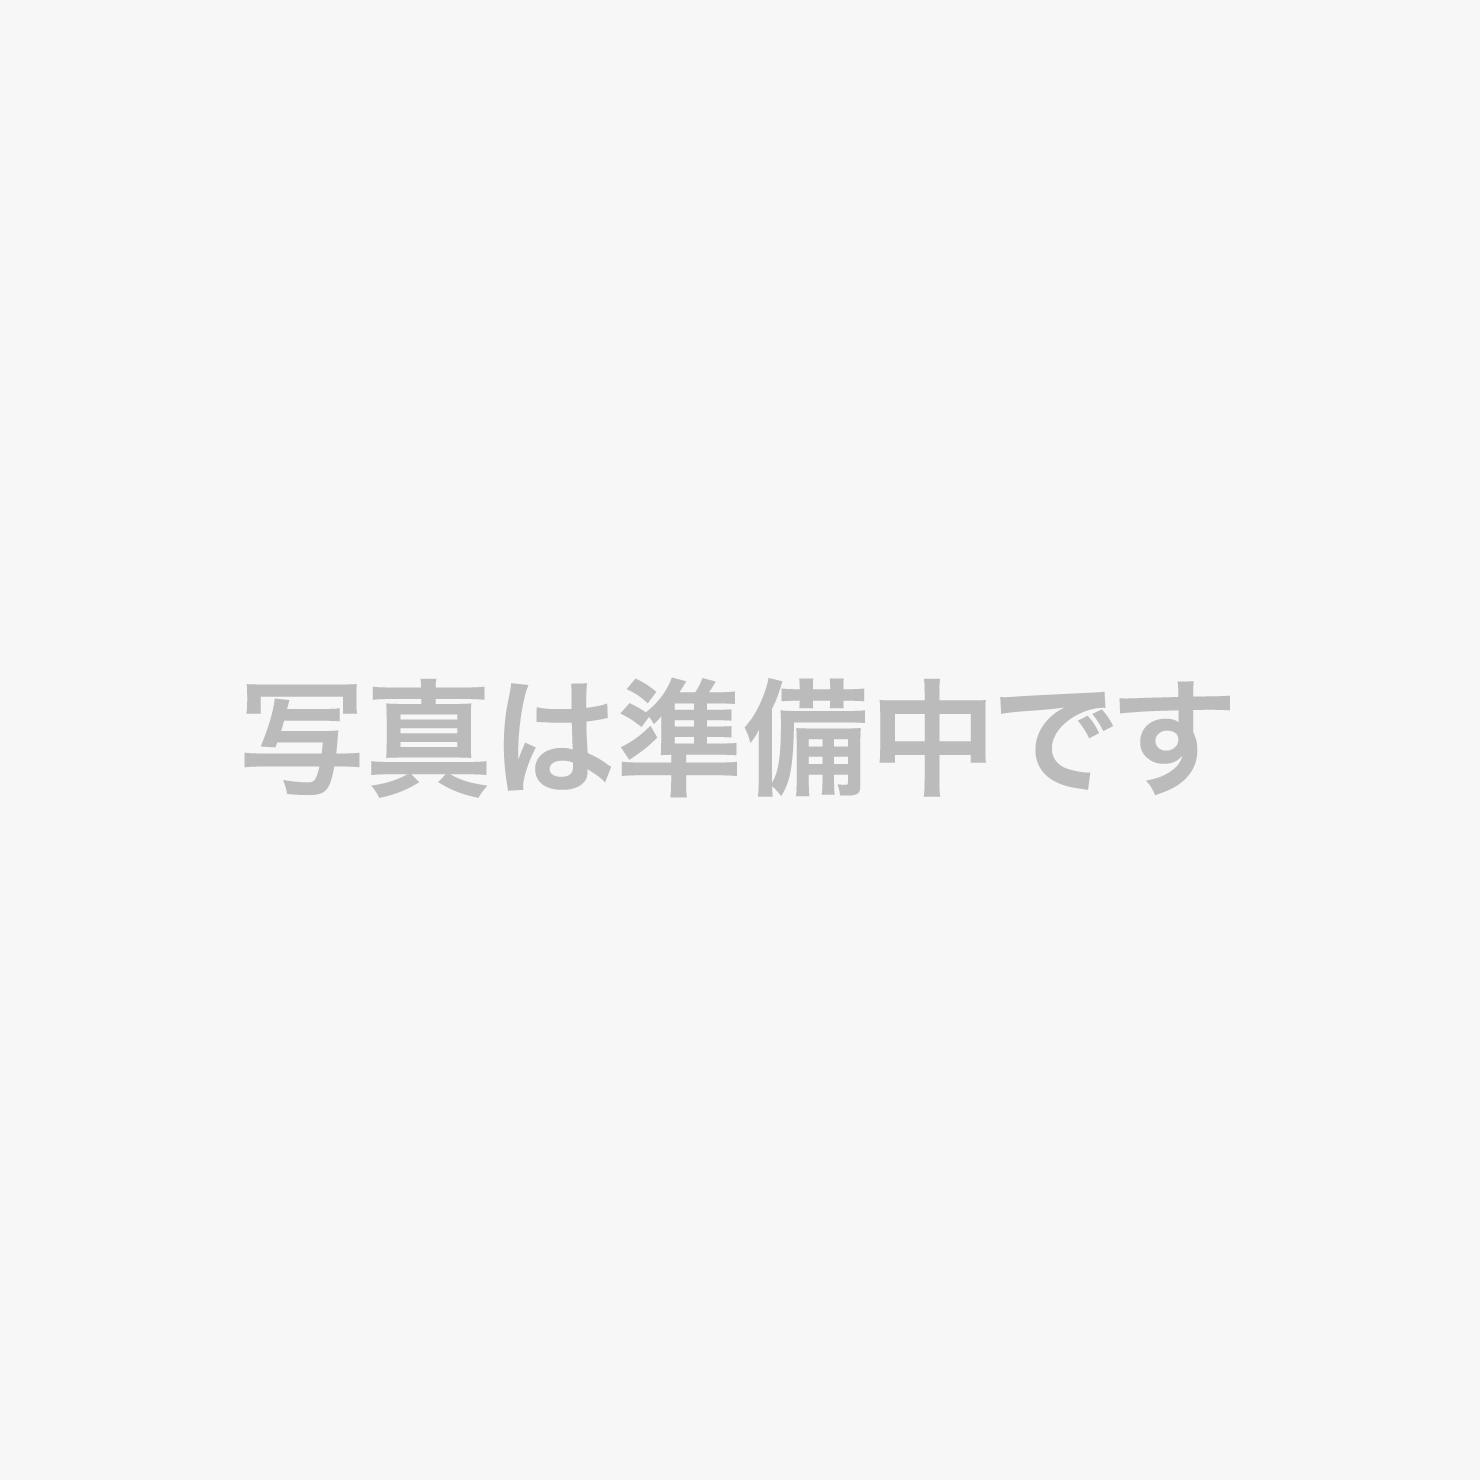 お風呂紹介/大浴場・露天風呂